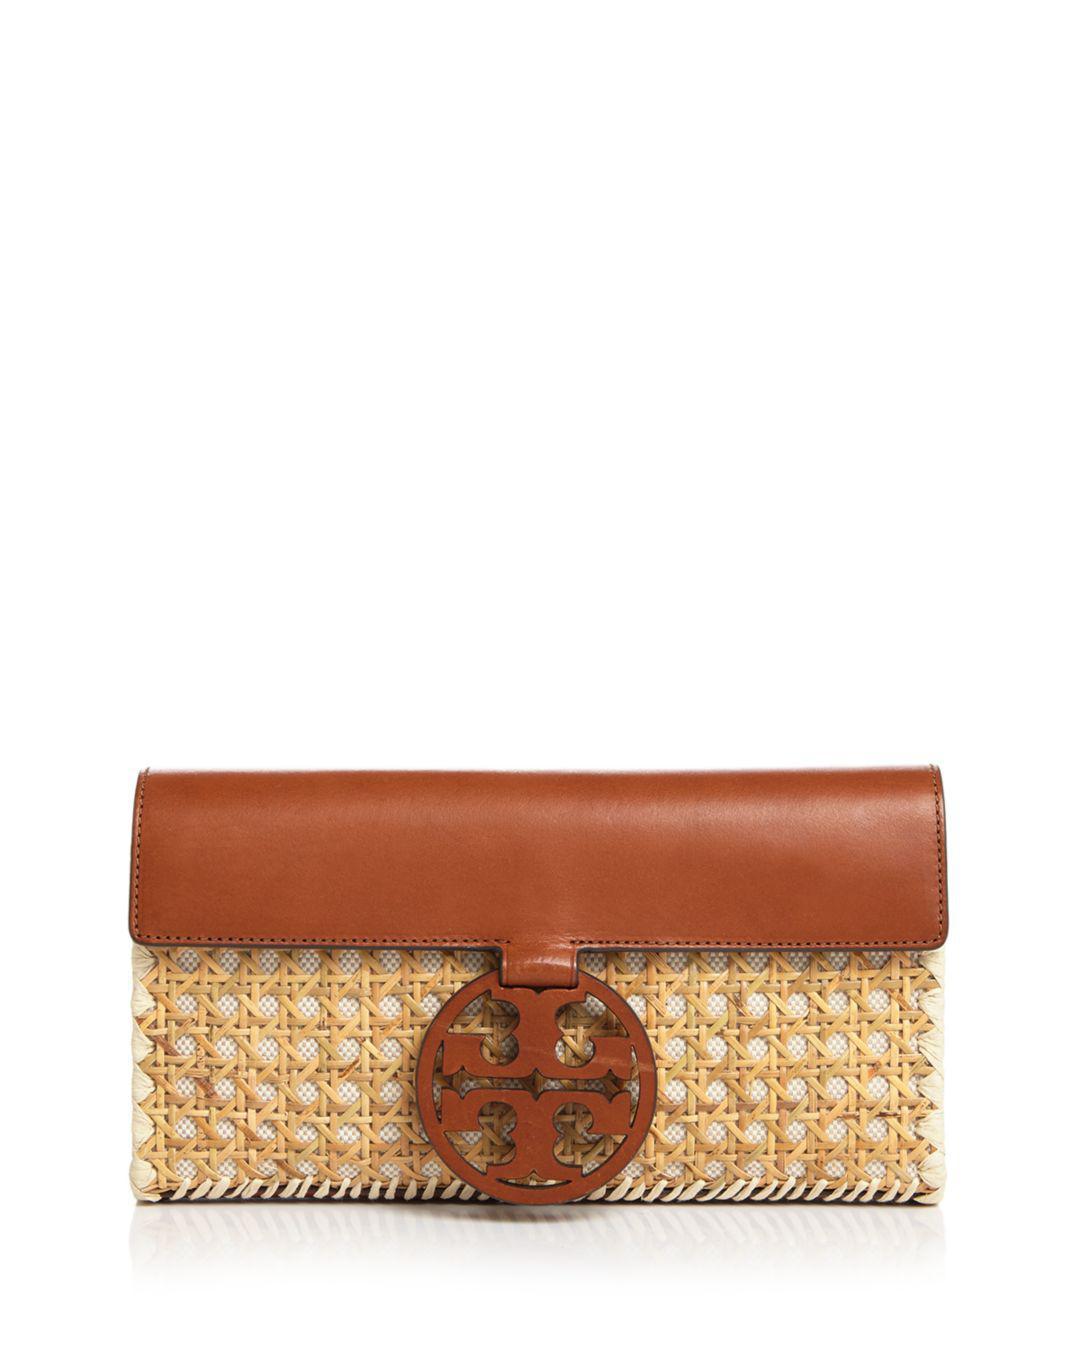 c89d218a4b8c Tory Burch. Women s Miller Rattan   Leather Clutch